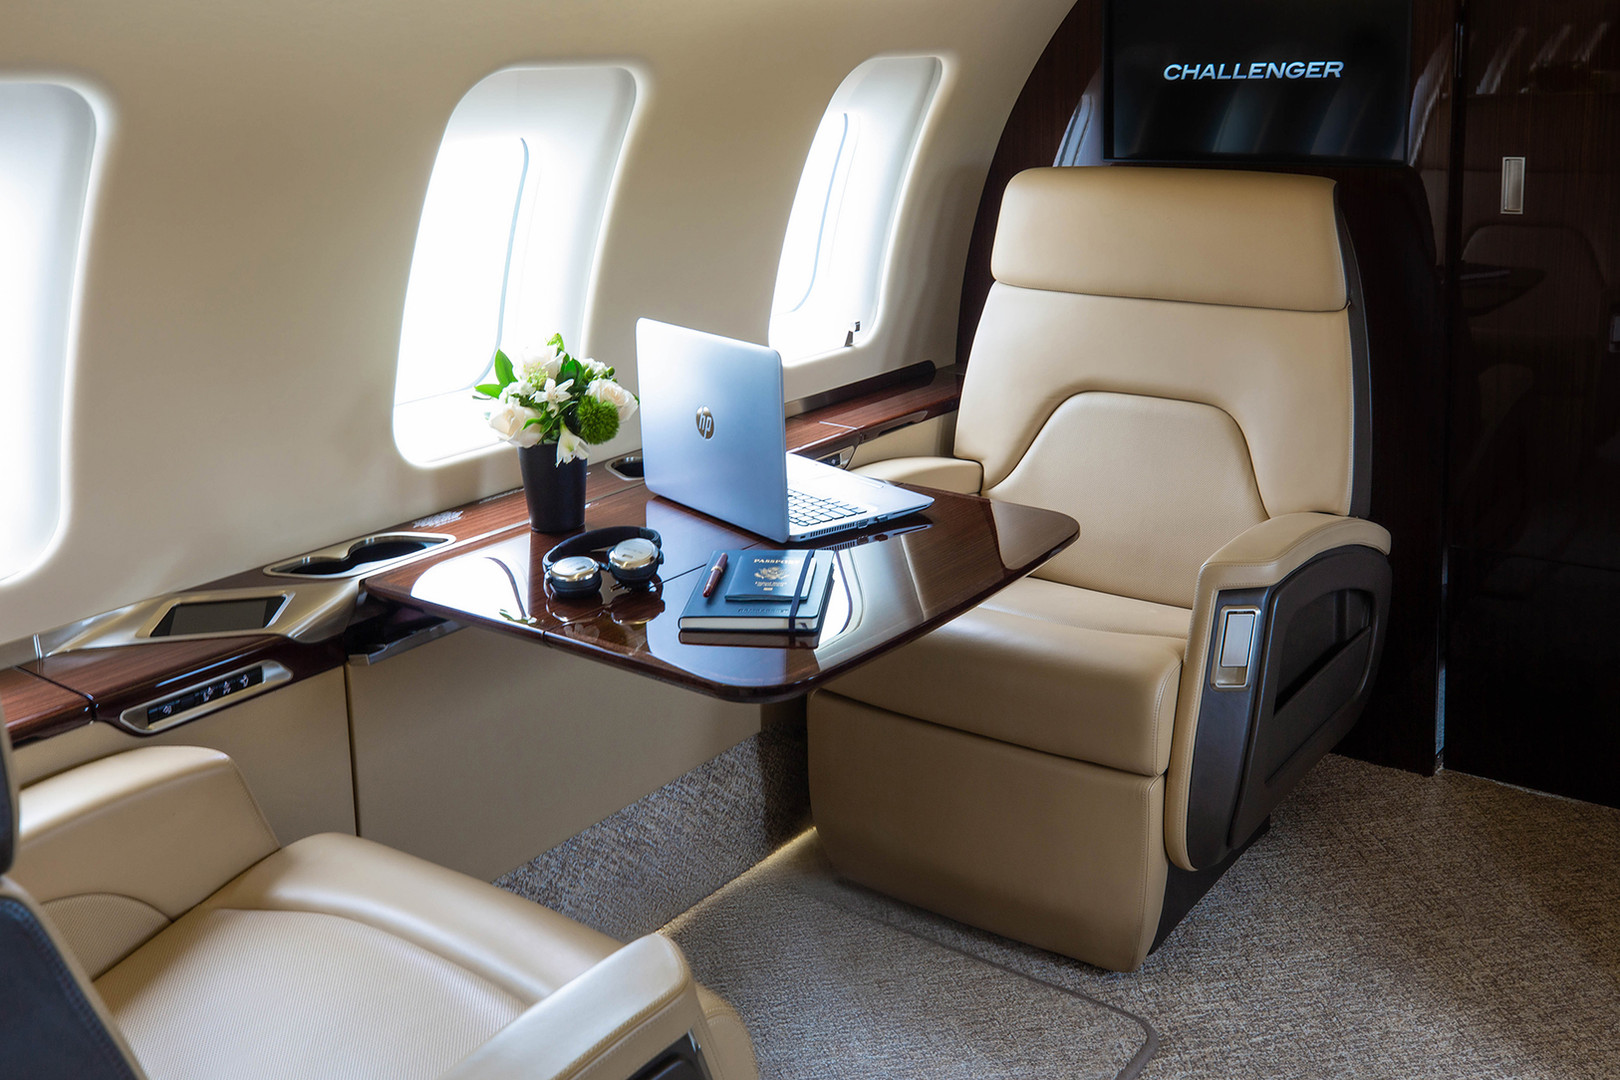 Challenger650-interior3-davincijet